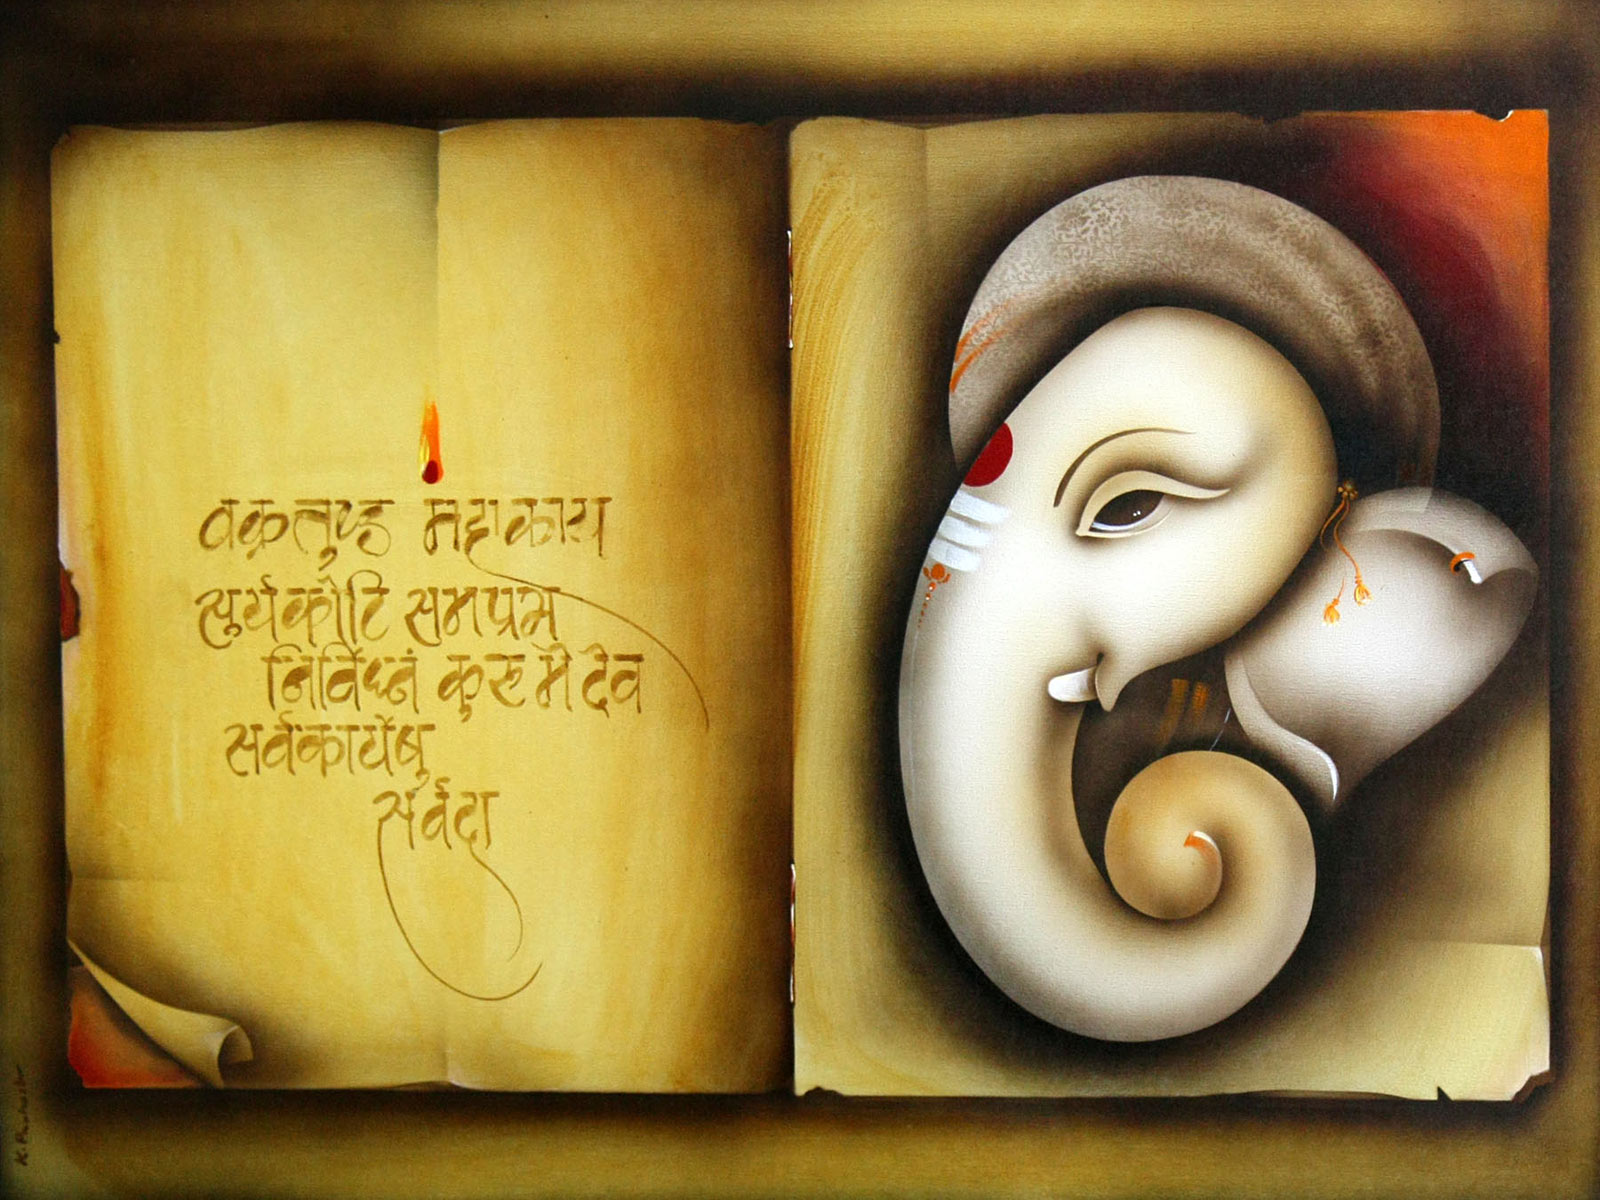 Laxmi Mantra Wallpapers for Desktop Mobile Free Download